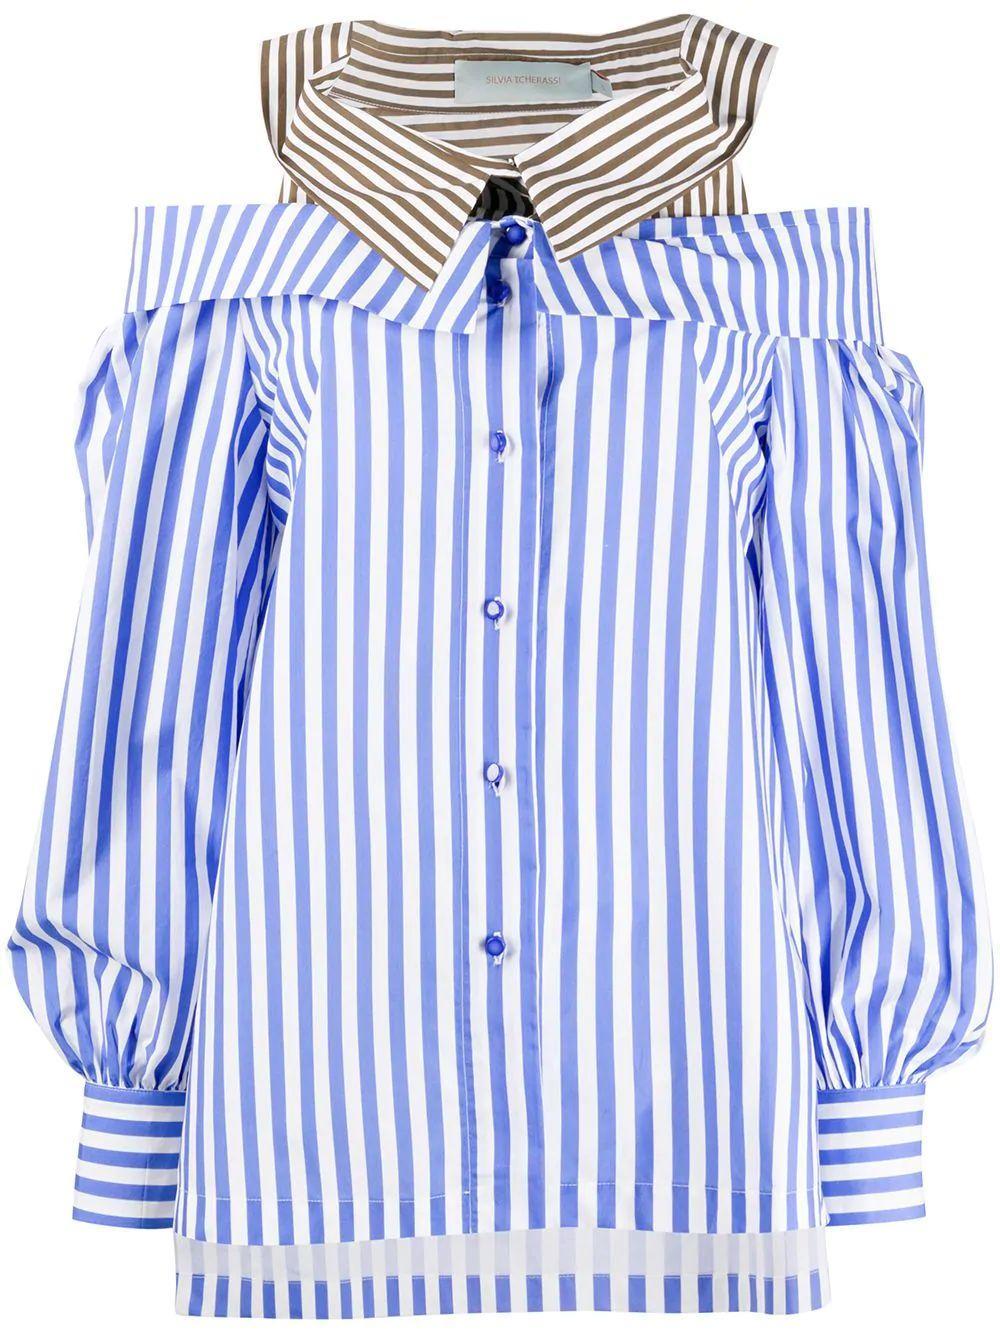 Double Collar Striped Blouse Item # AIDA-SHIRT